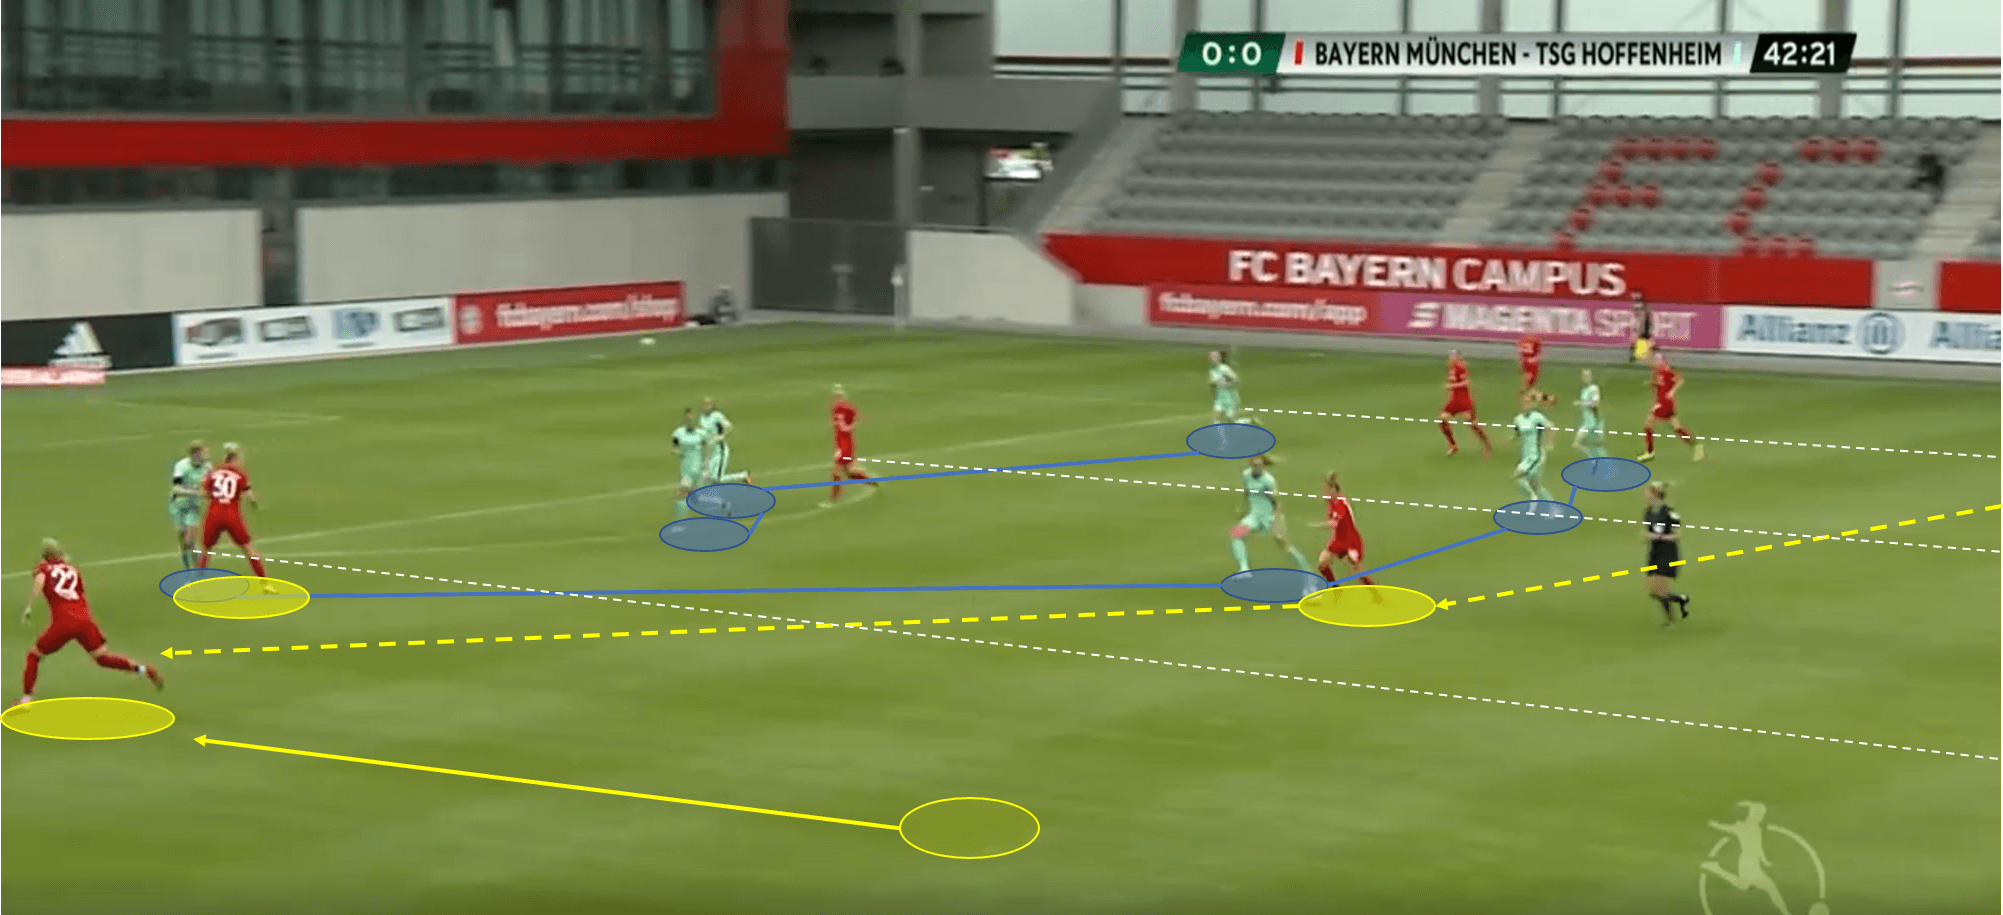 Frauen Bundesliga 2019/20: Bayern Munich vs Hoffenheim - tactical analysis tactics